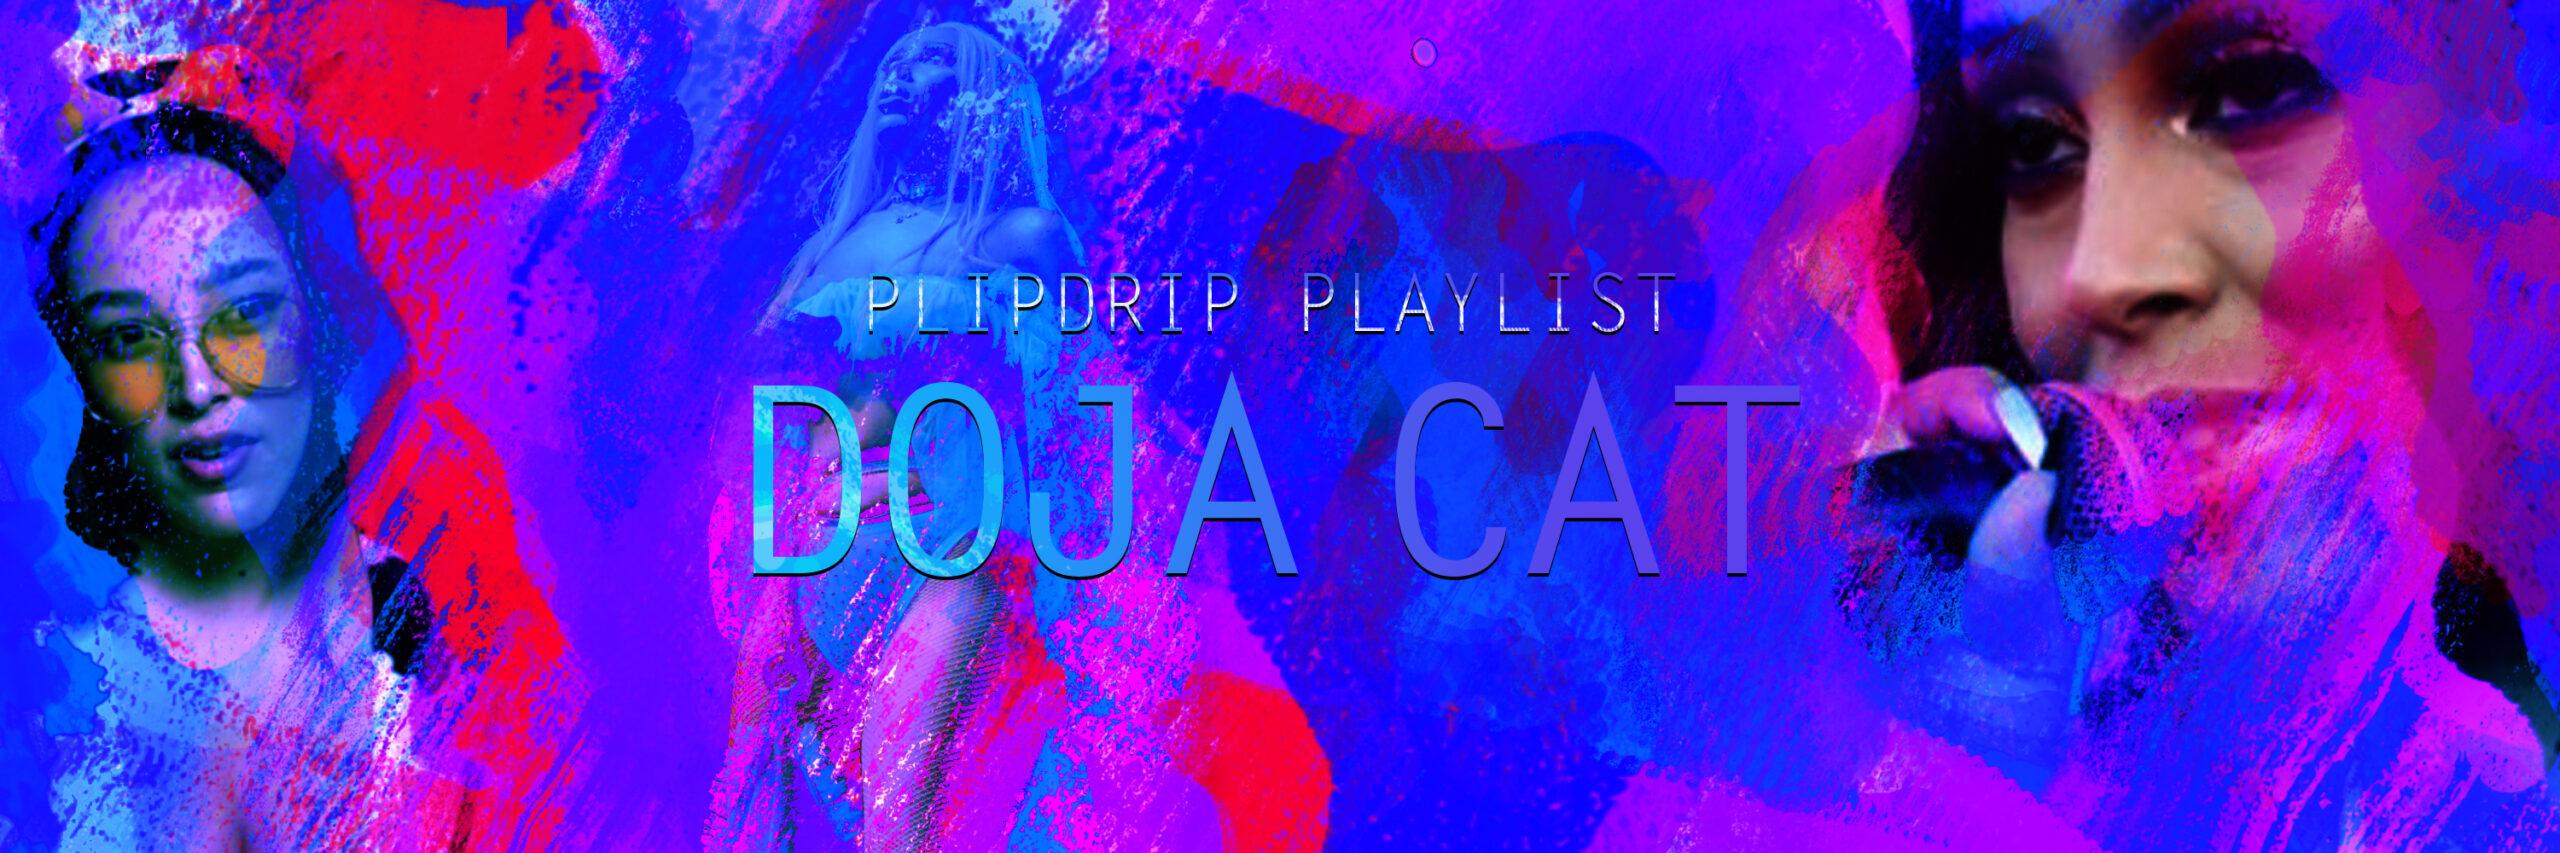 PF-doja-cat-banner-1